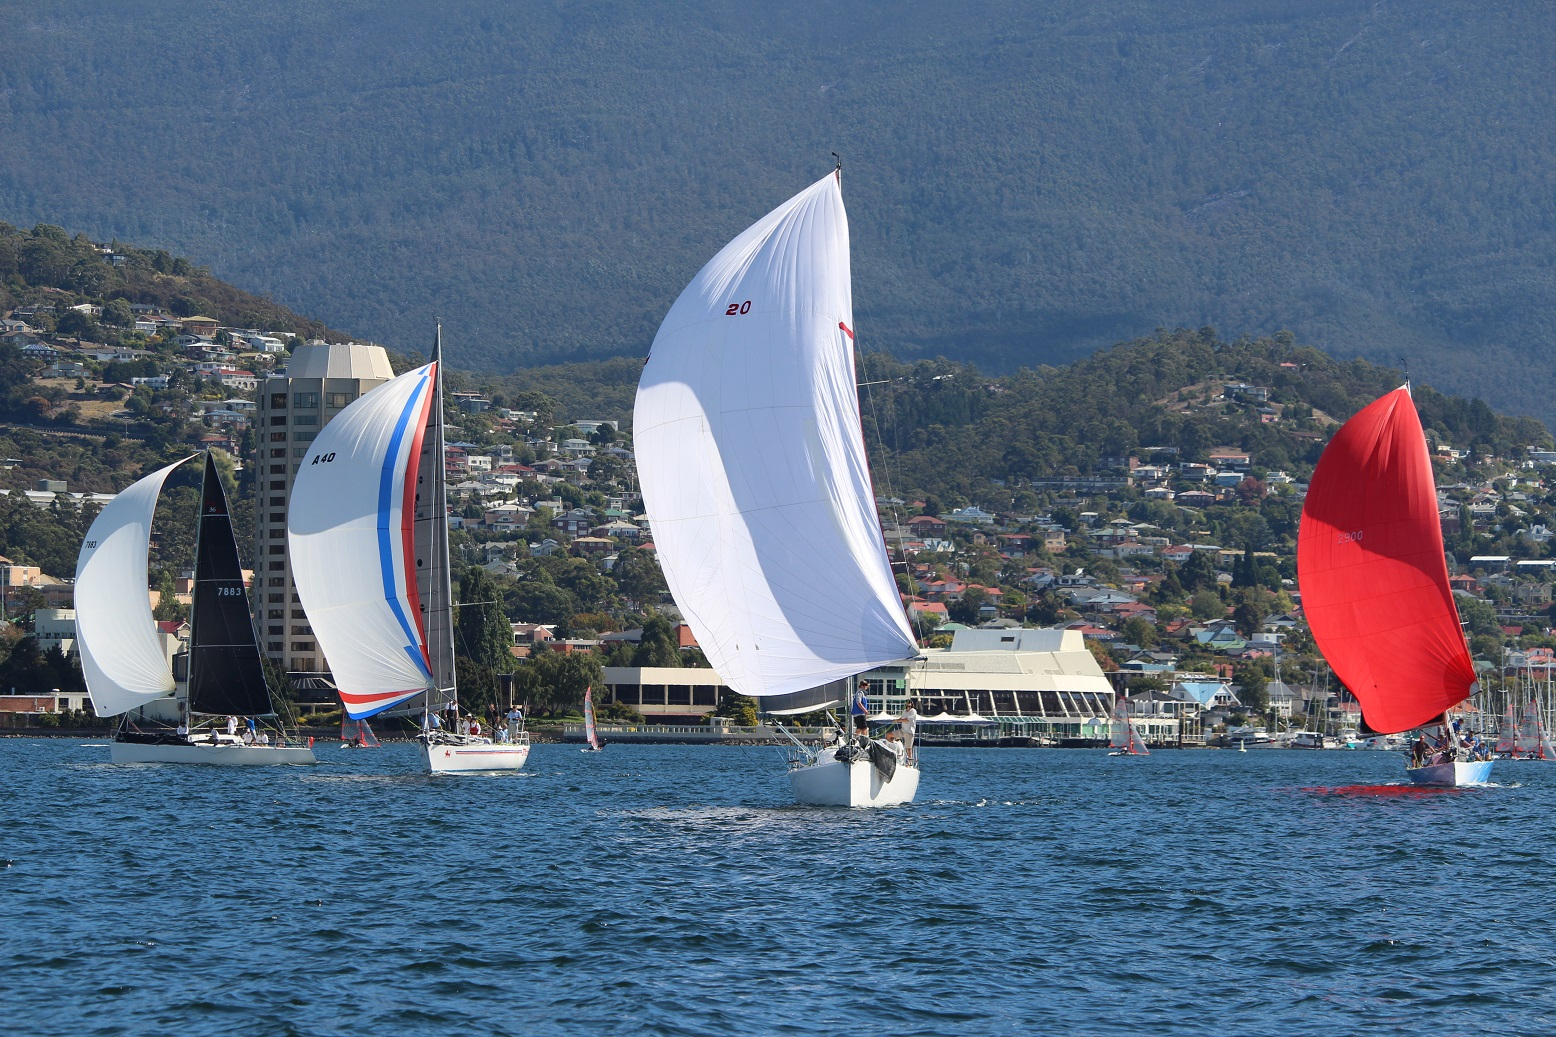 Hobart's Combined Clubs fleet racing on the Derwent on Saturday. Photo Peter Watson.